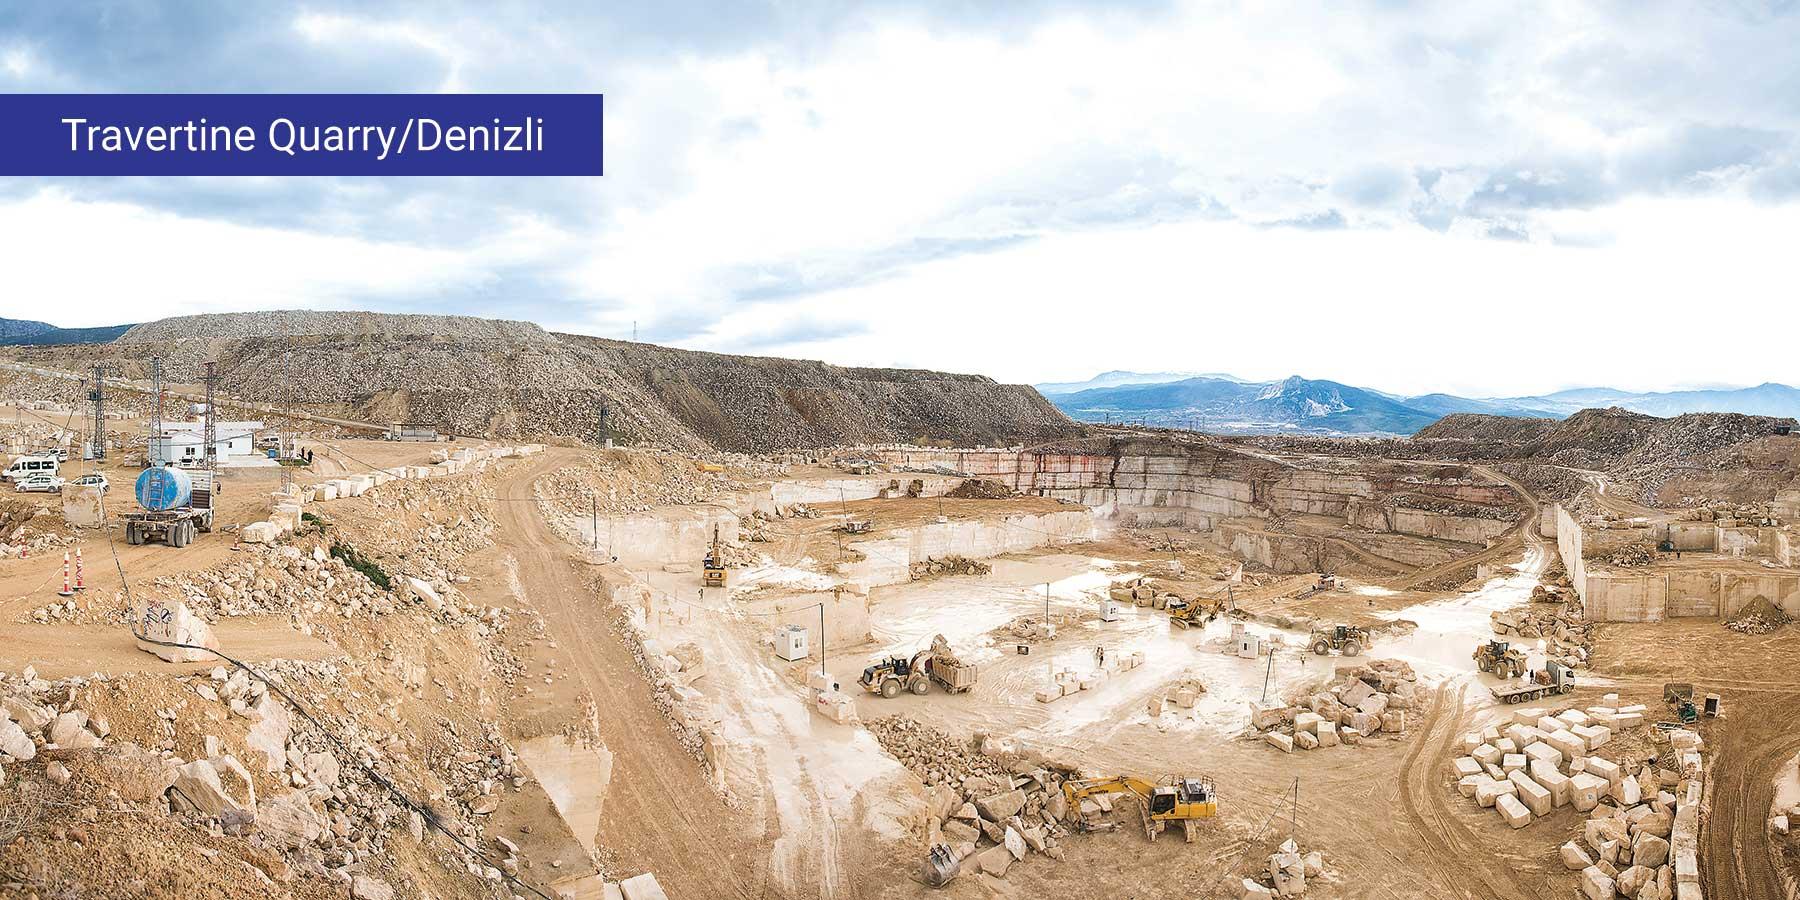 Travertine Quarry / Denizli